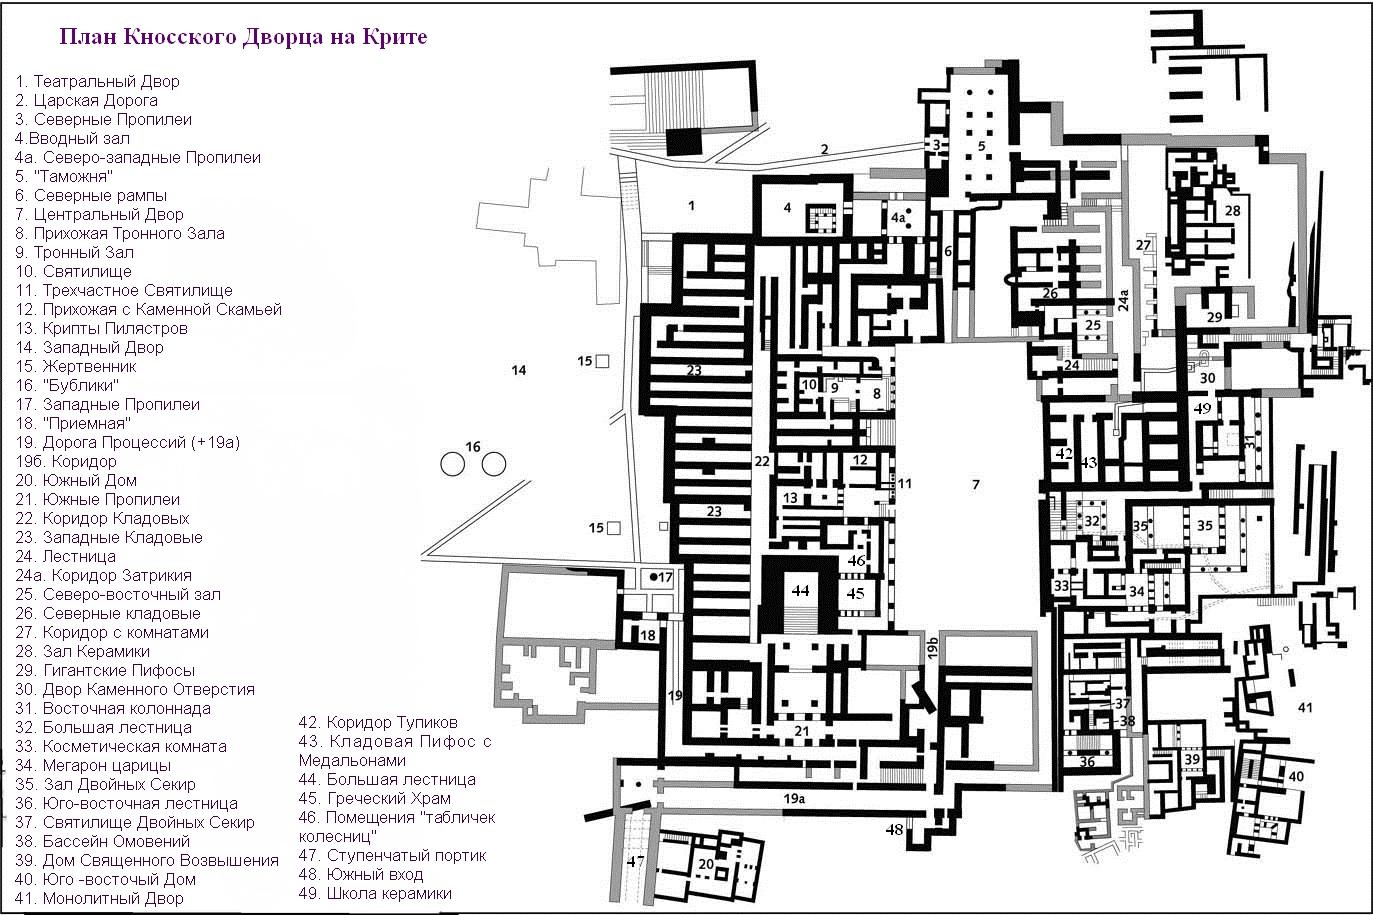 karta knosskogo dvorca